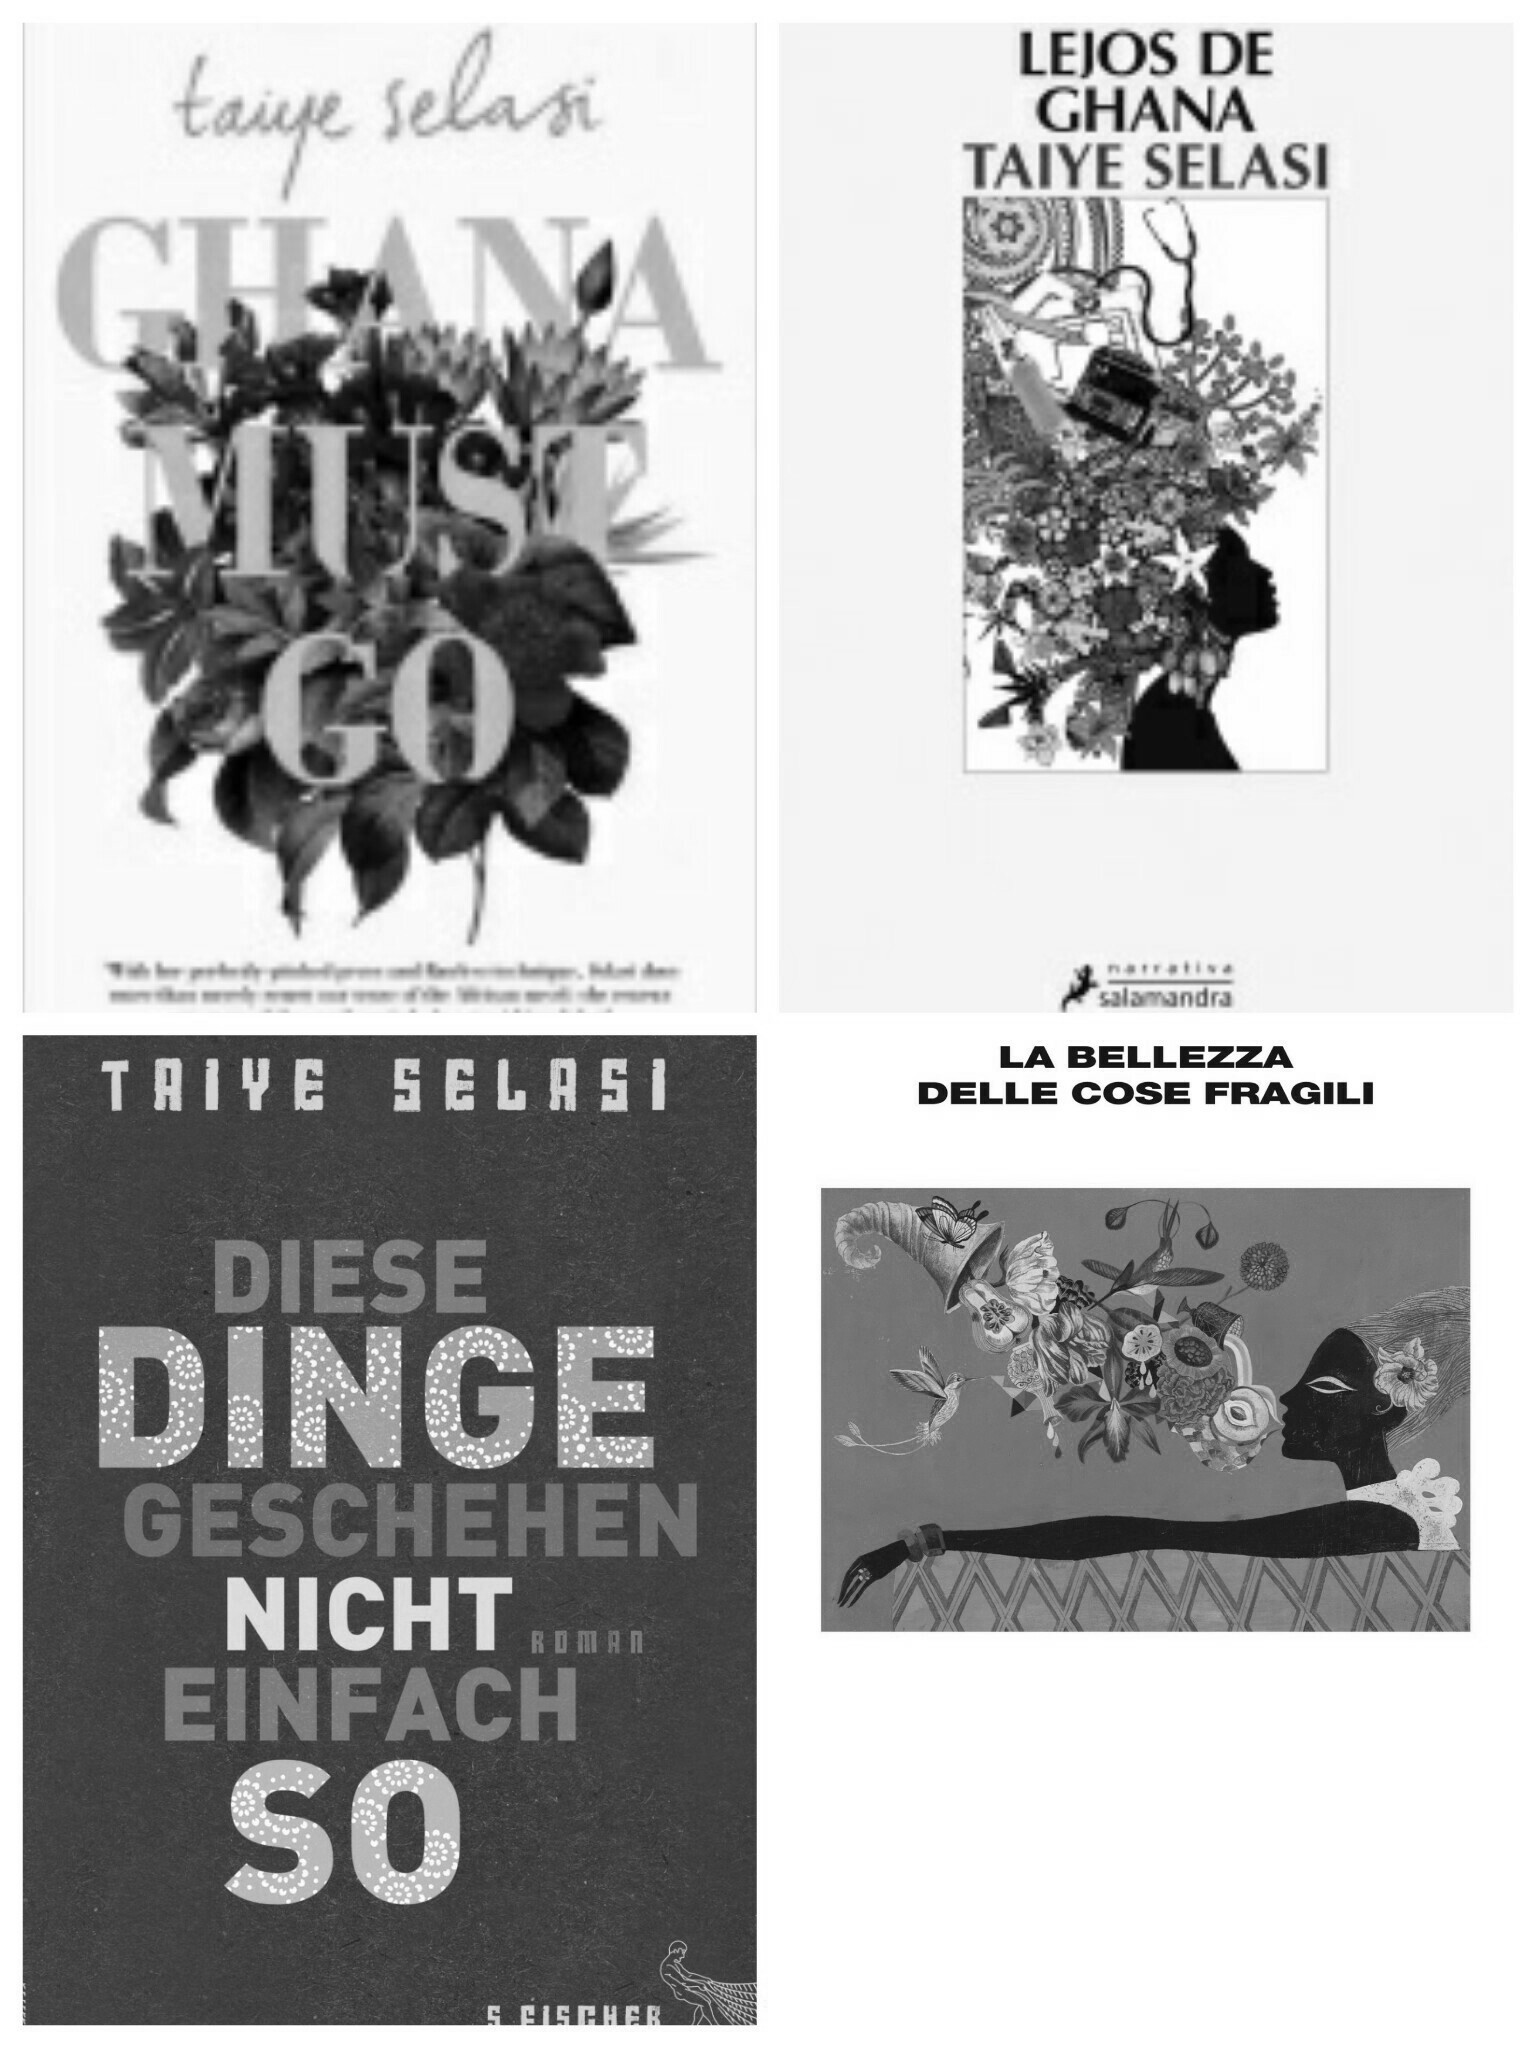 Libros-T.Selasi-ConvertImage